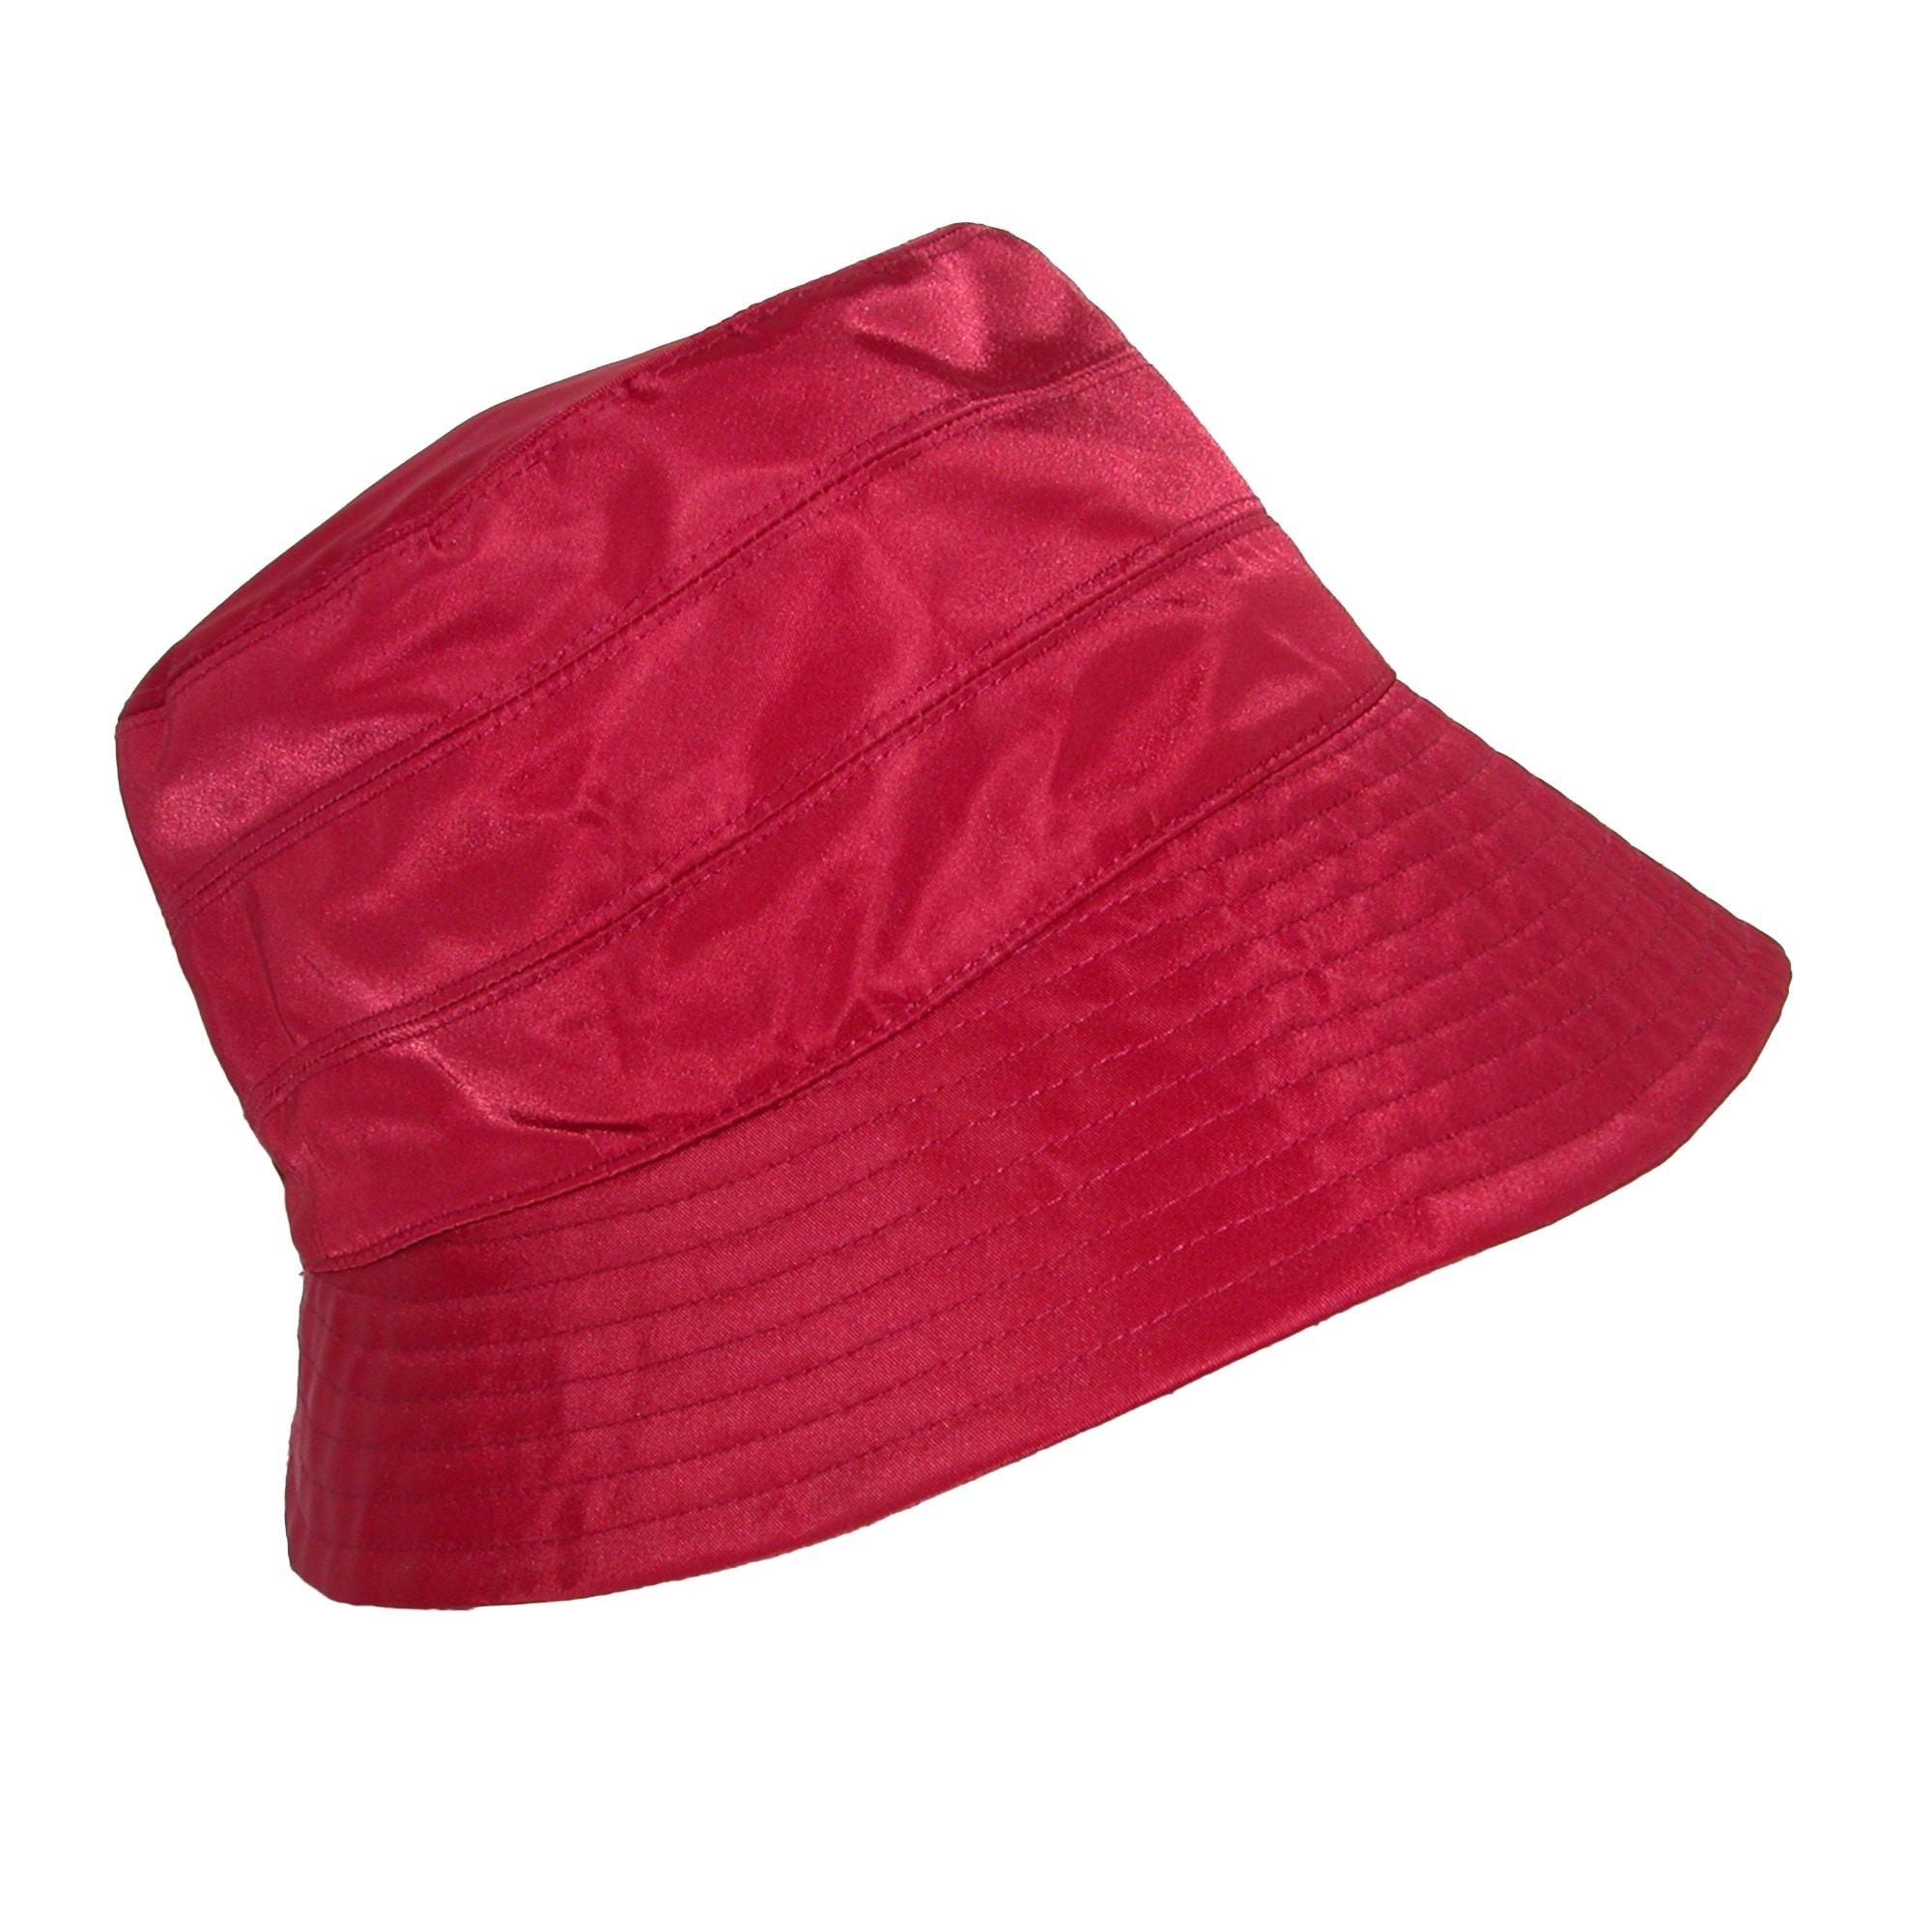 Dorfman Pacific Hats  0bb63e980cc8